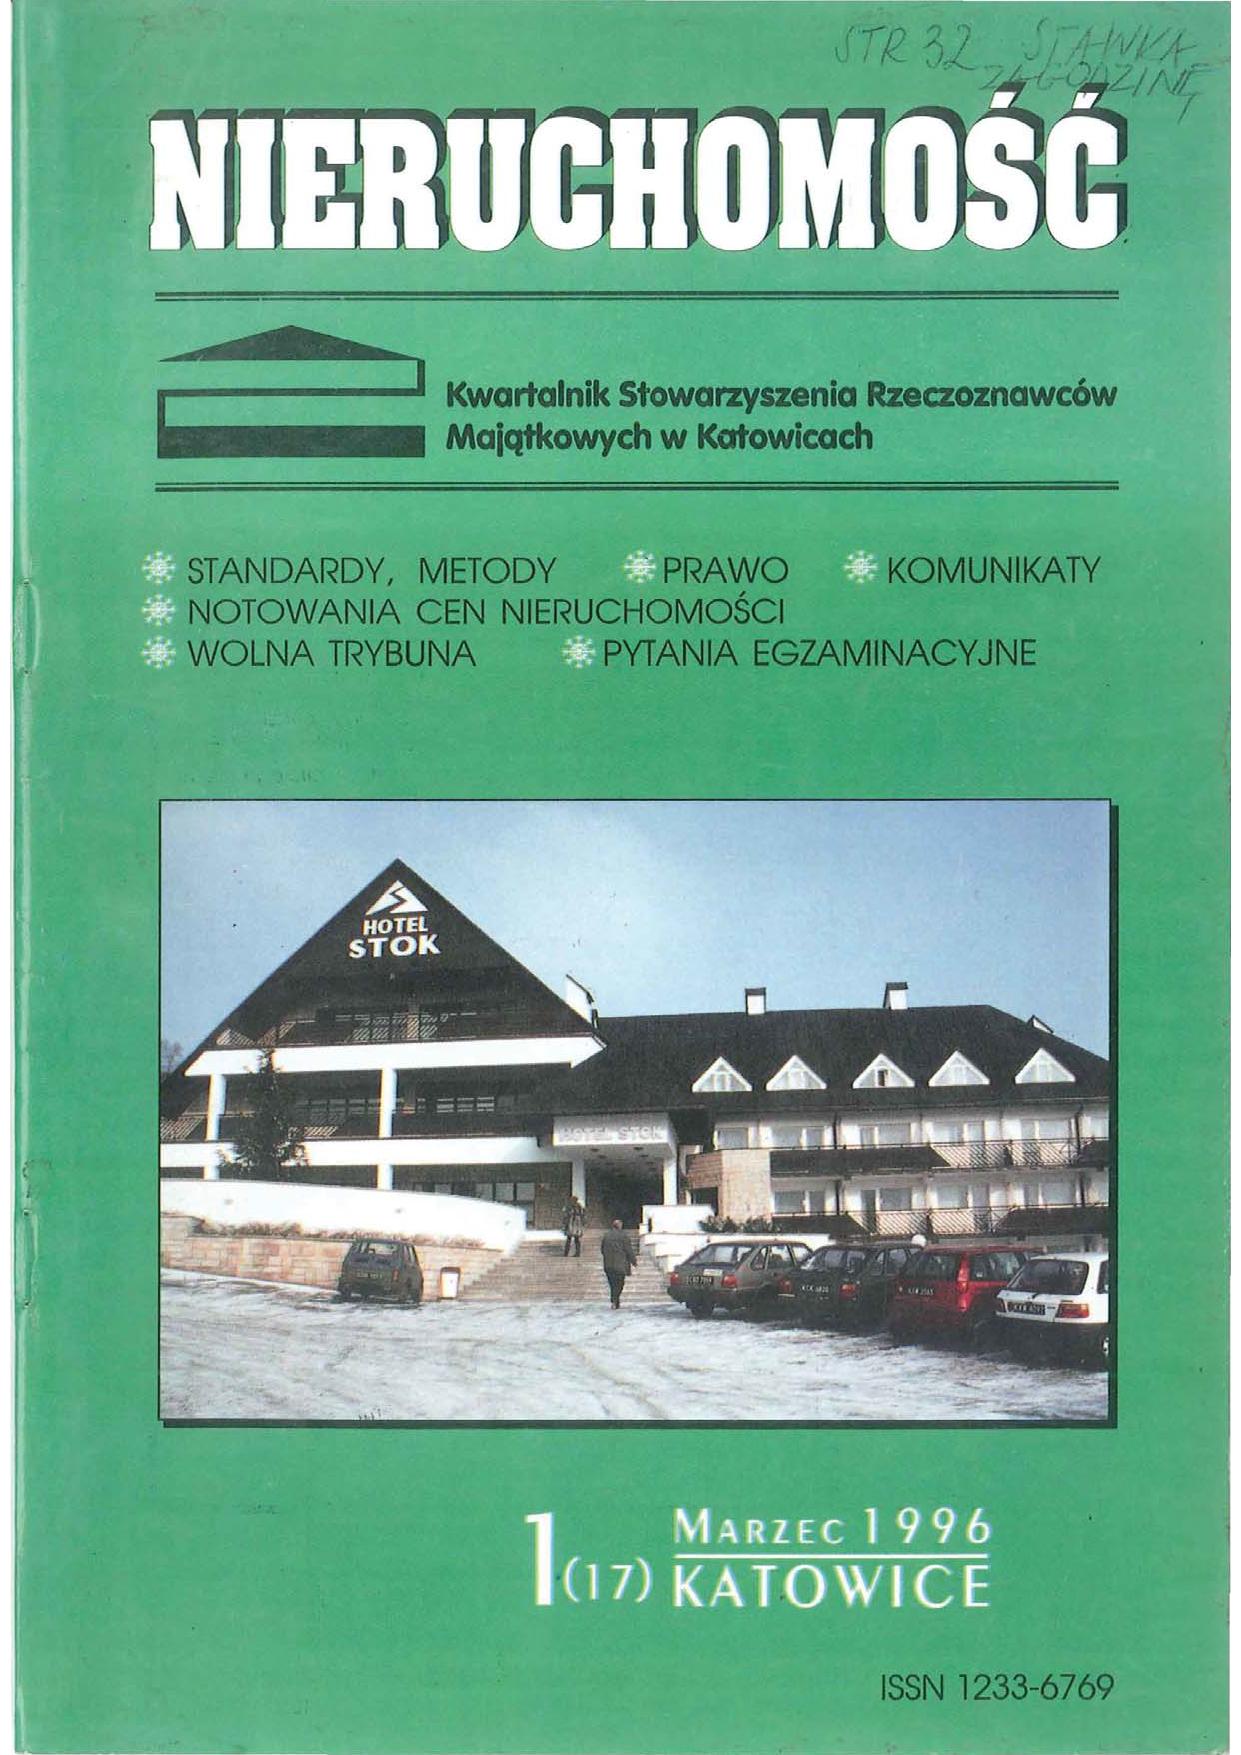 Nieruchomość kwartalnik 1(17) 1996 marzec